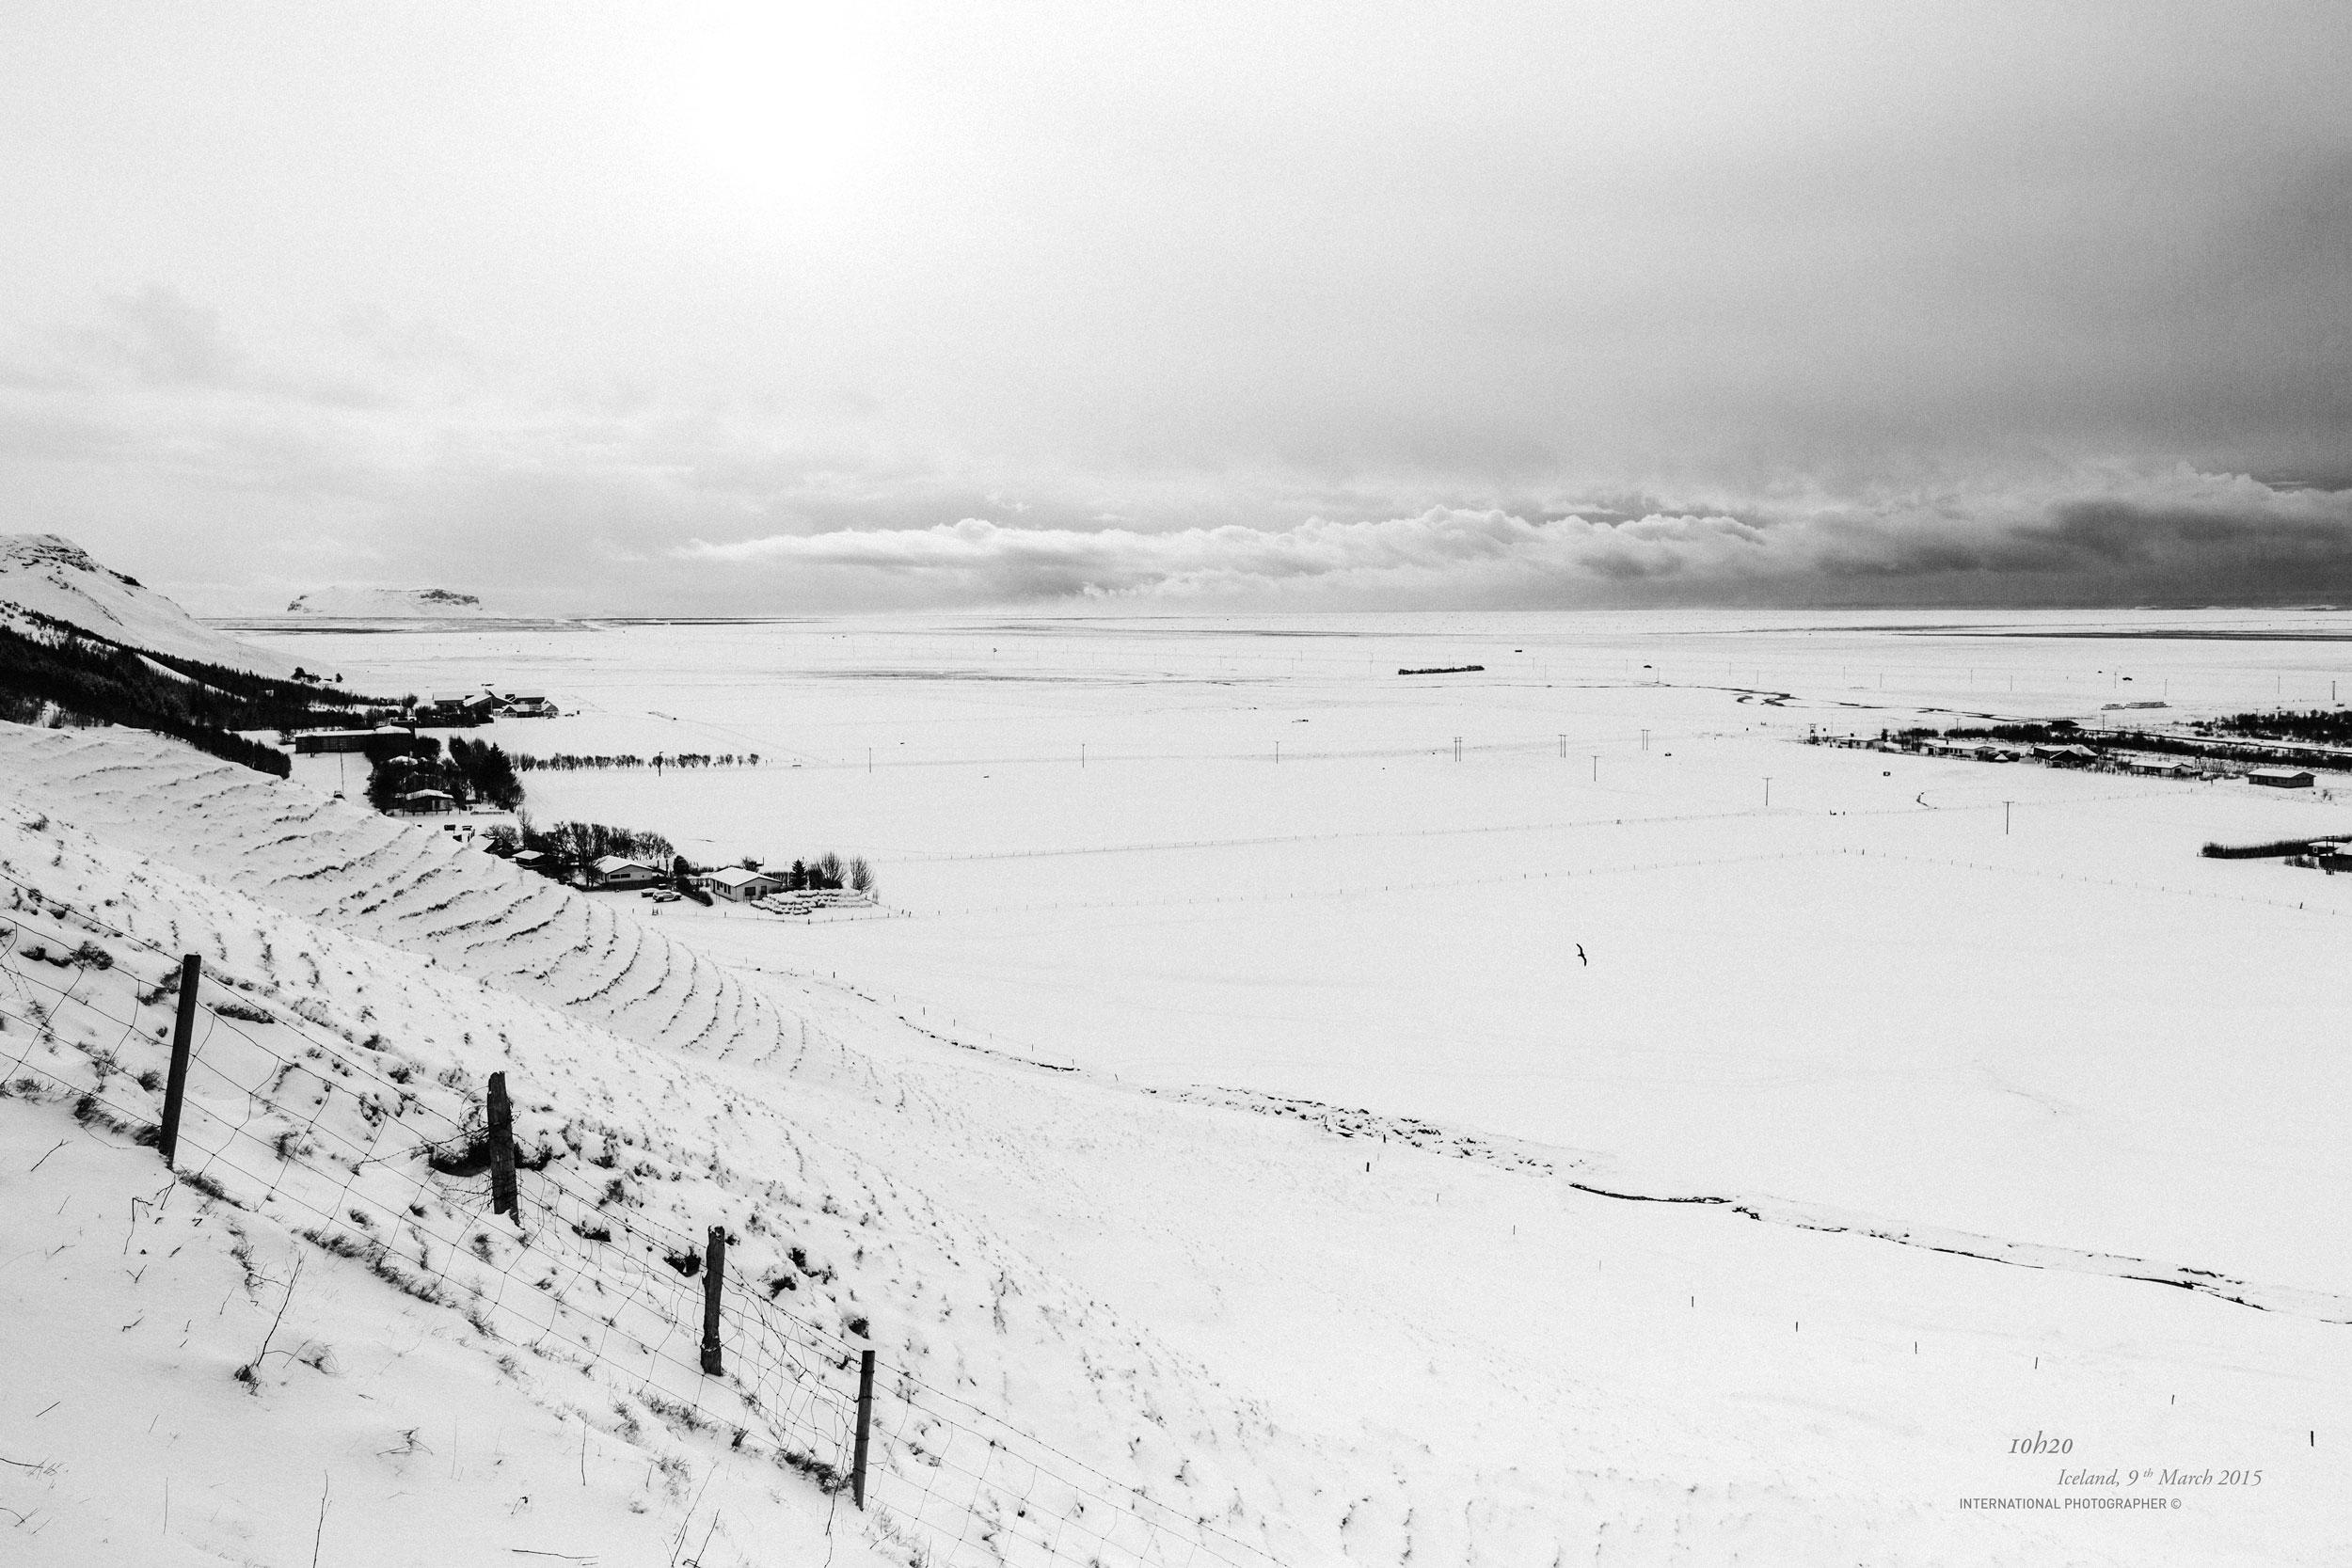 La plaine de Skogar recouverte de neige